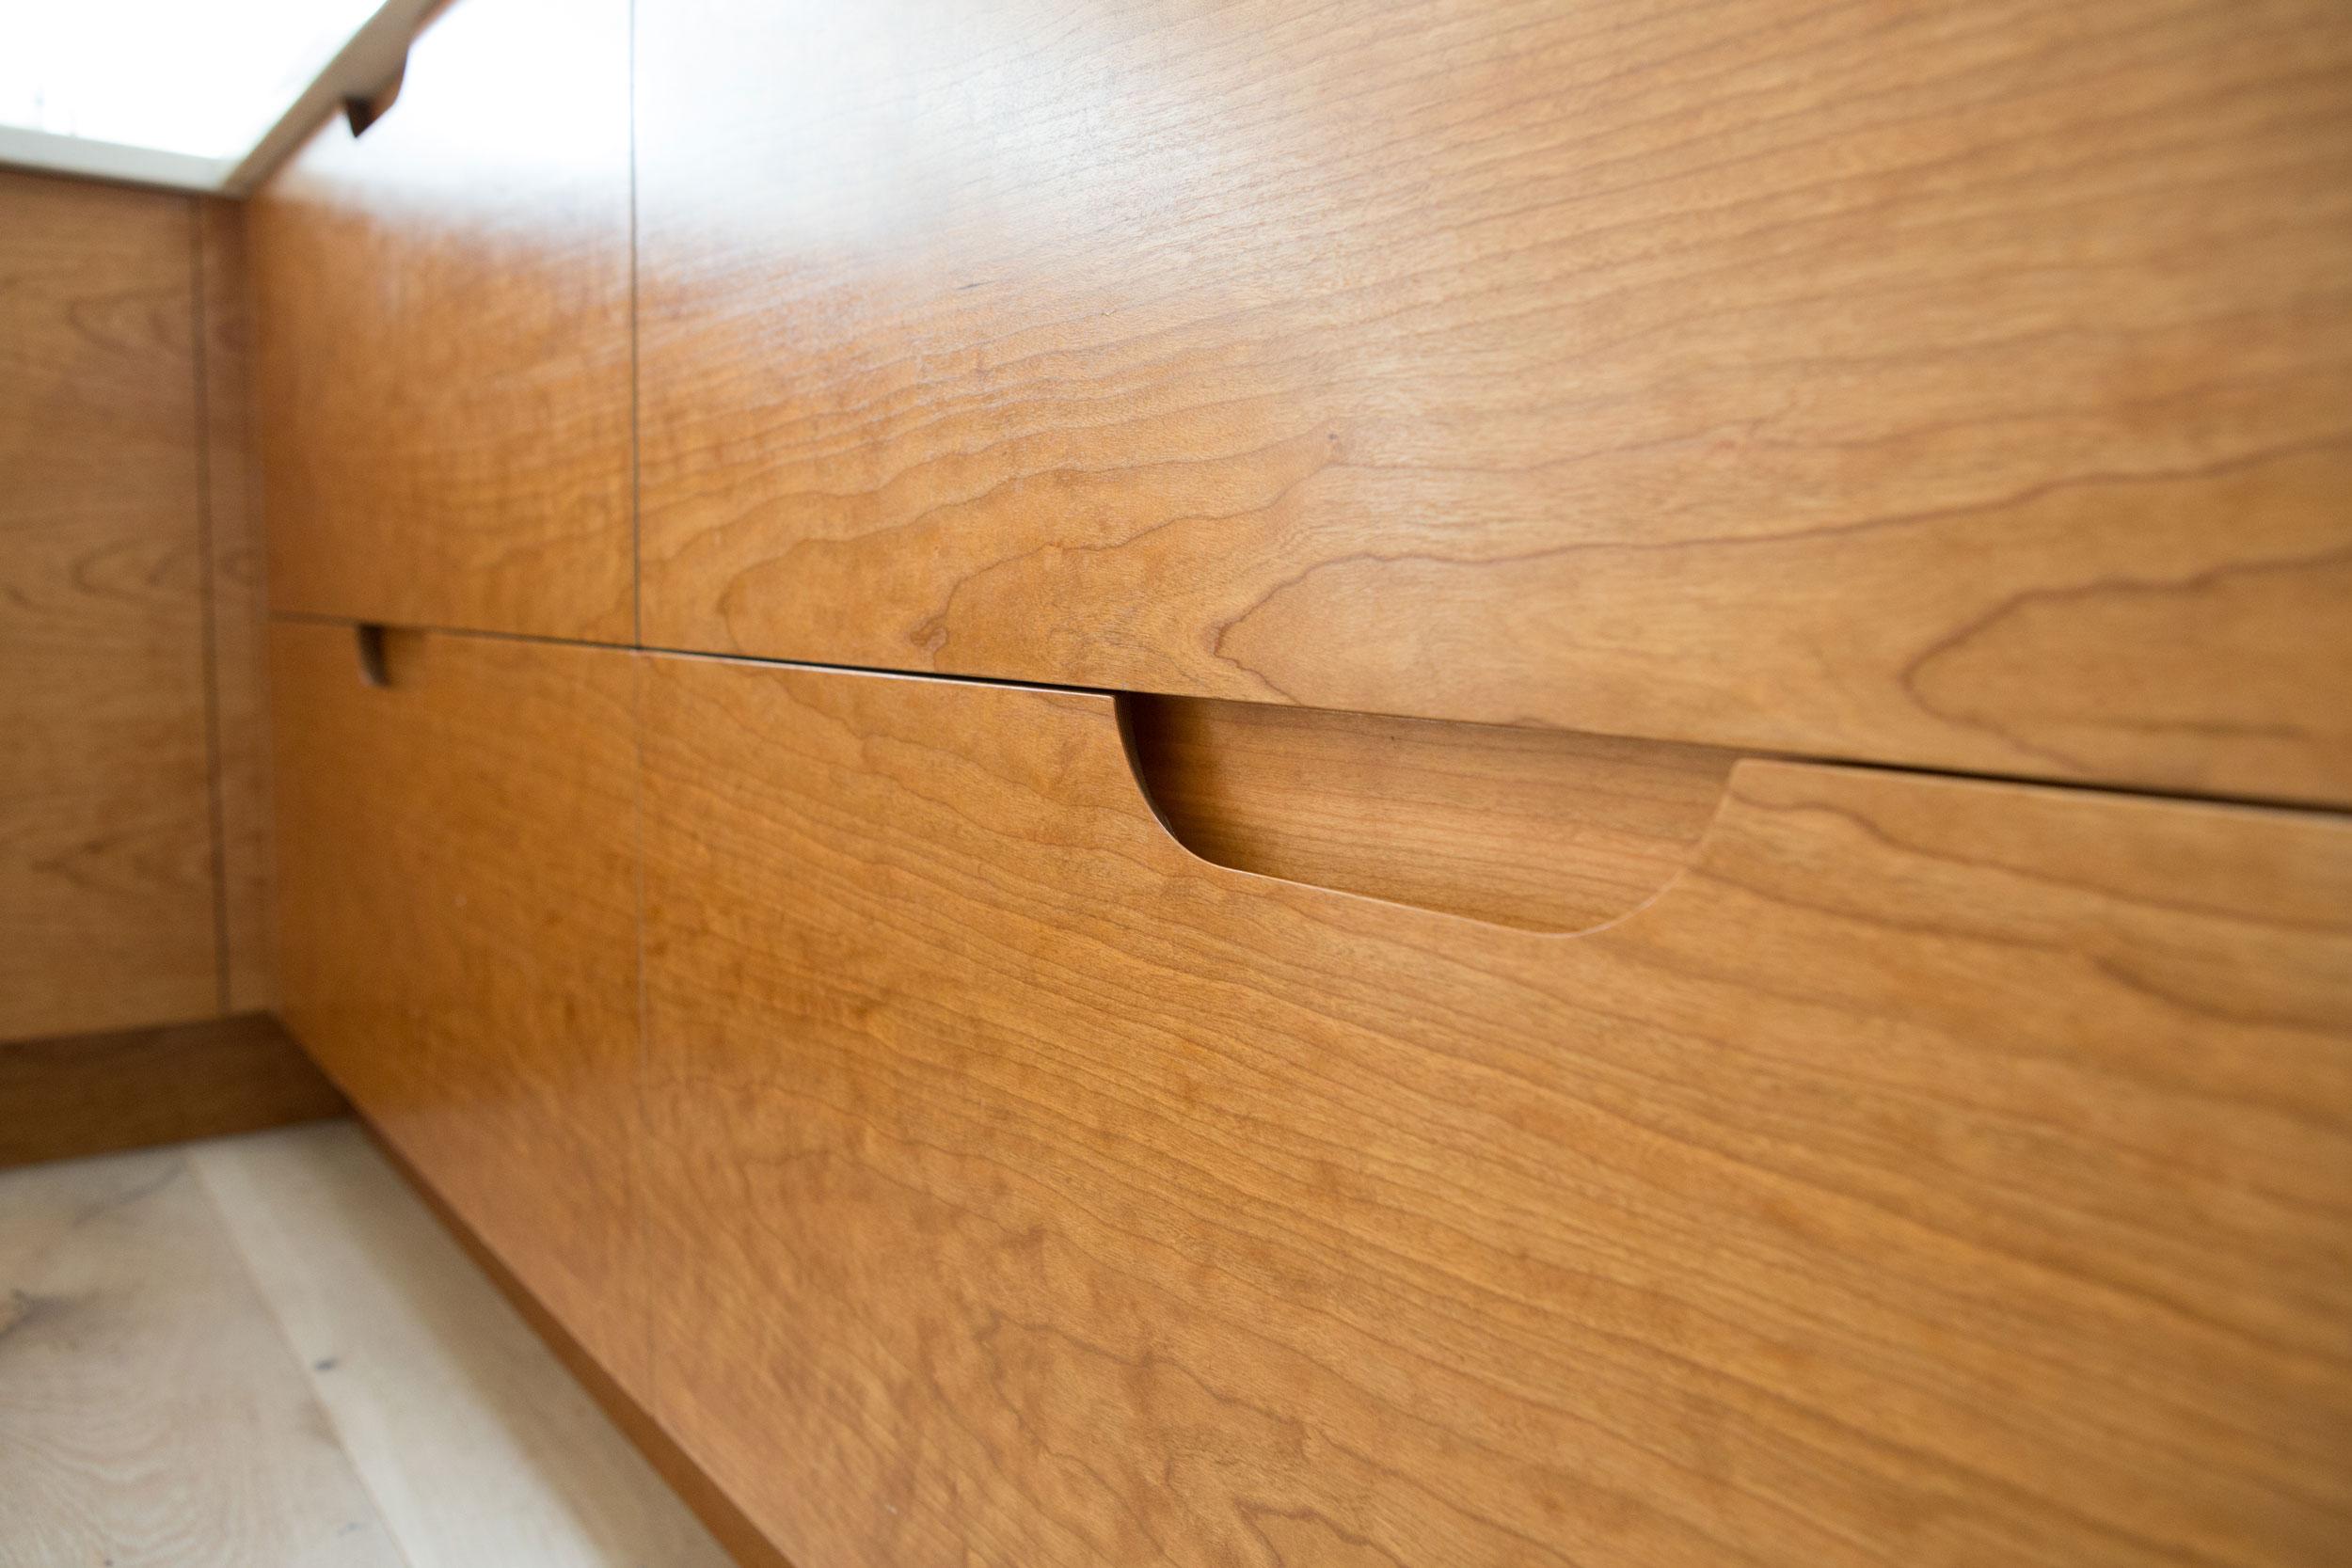 retro, routed handles, drawers, birch, scandi